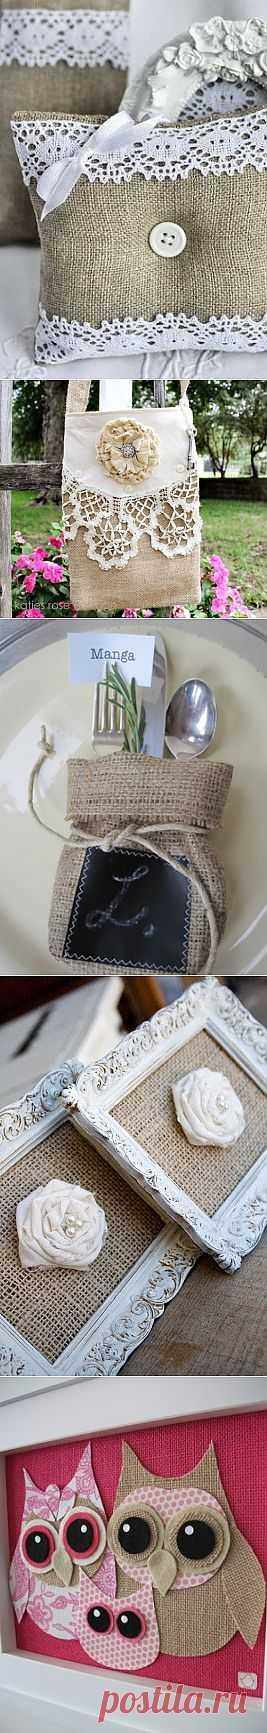 Идеи декора с мешковиной.